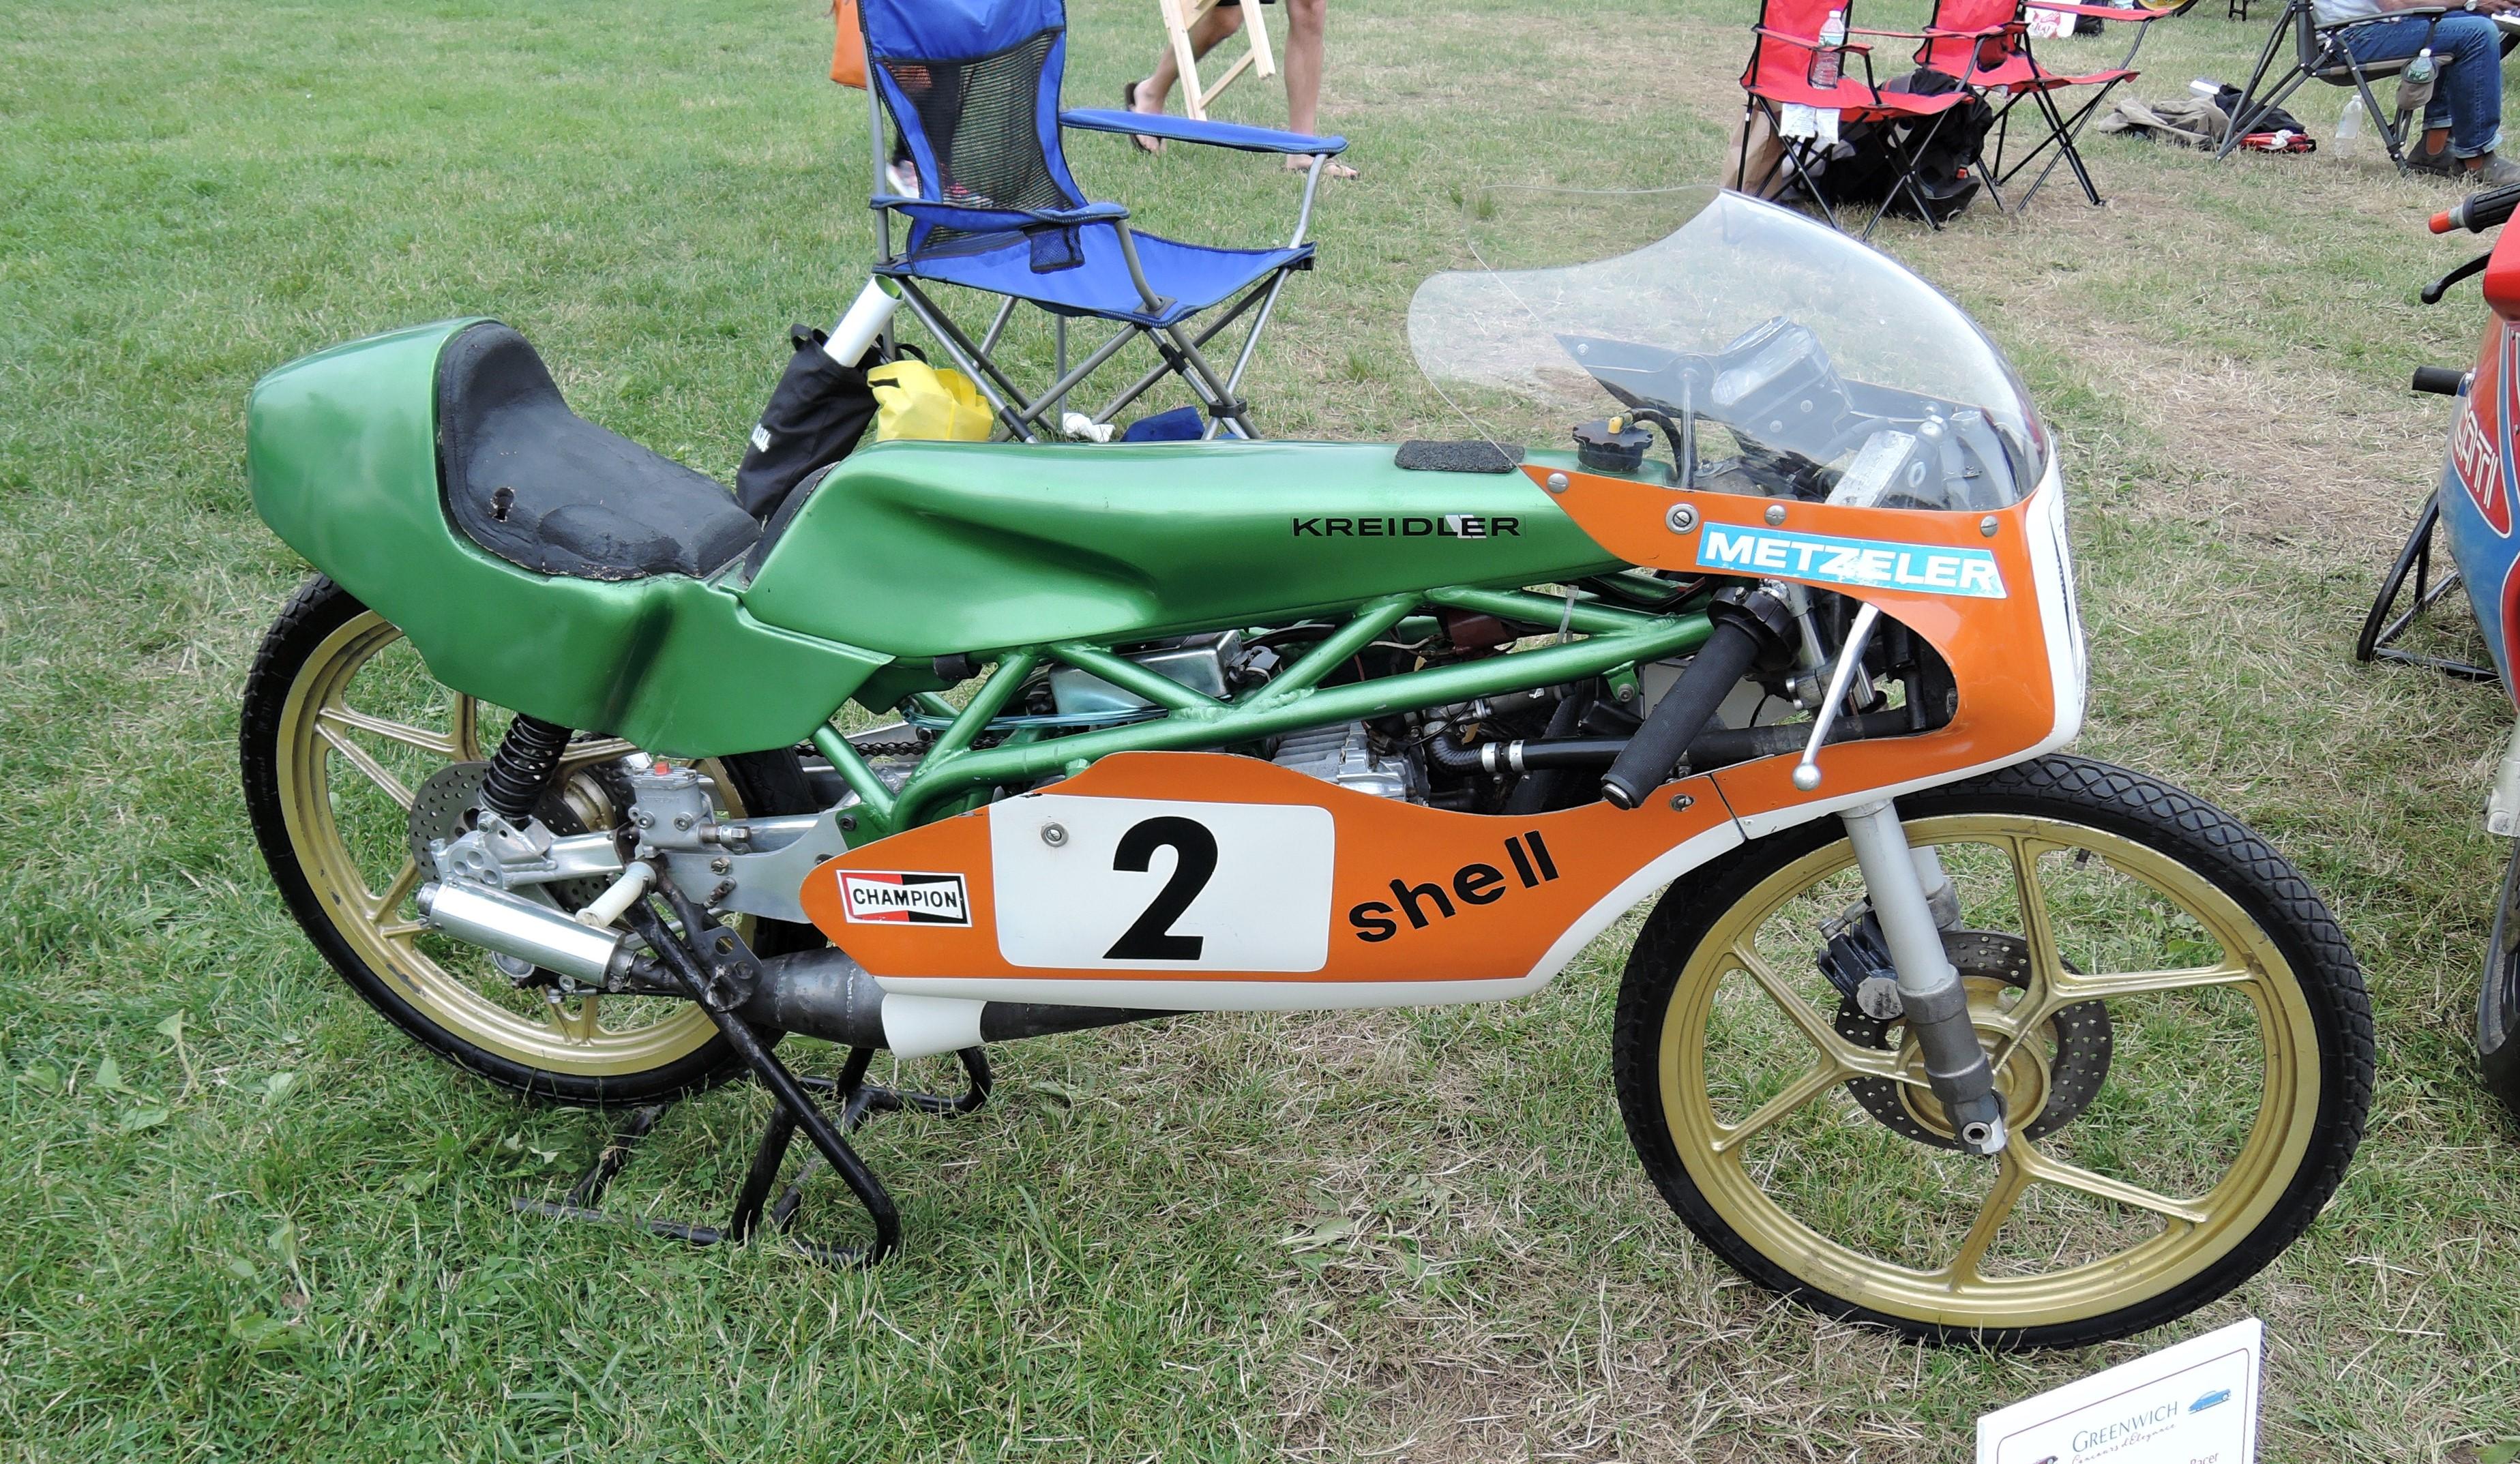 green/orange 1981 Kreidler 50cc Grand Prix Racer - Greenwich Concours d'Elegance 2017